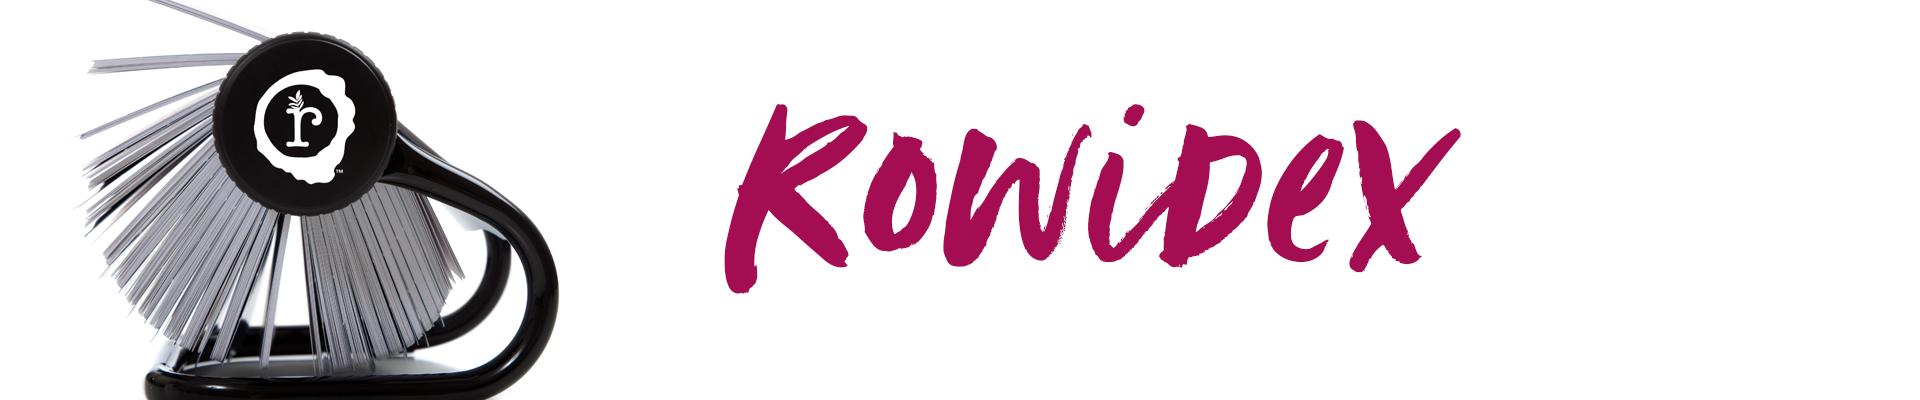 rowidex-horz-1920×400